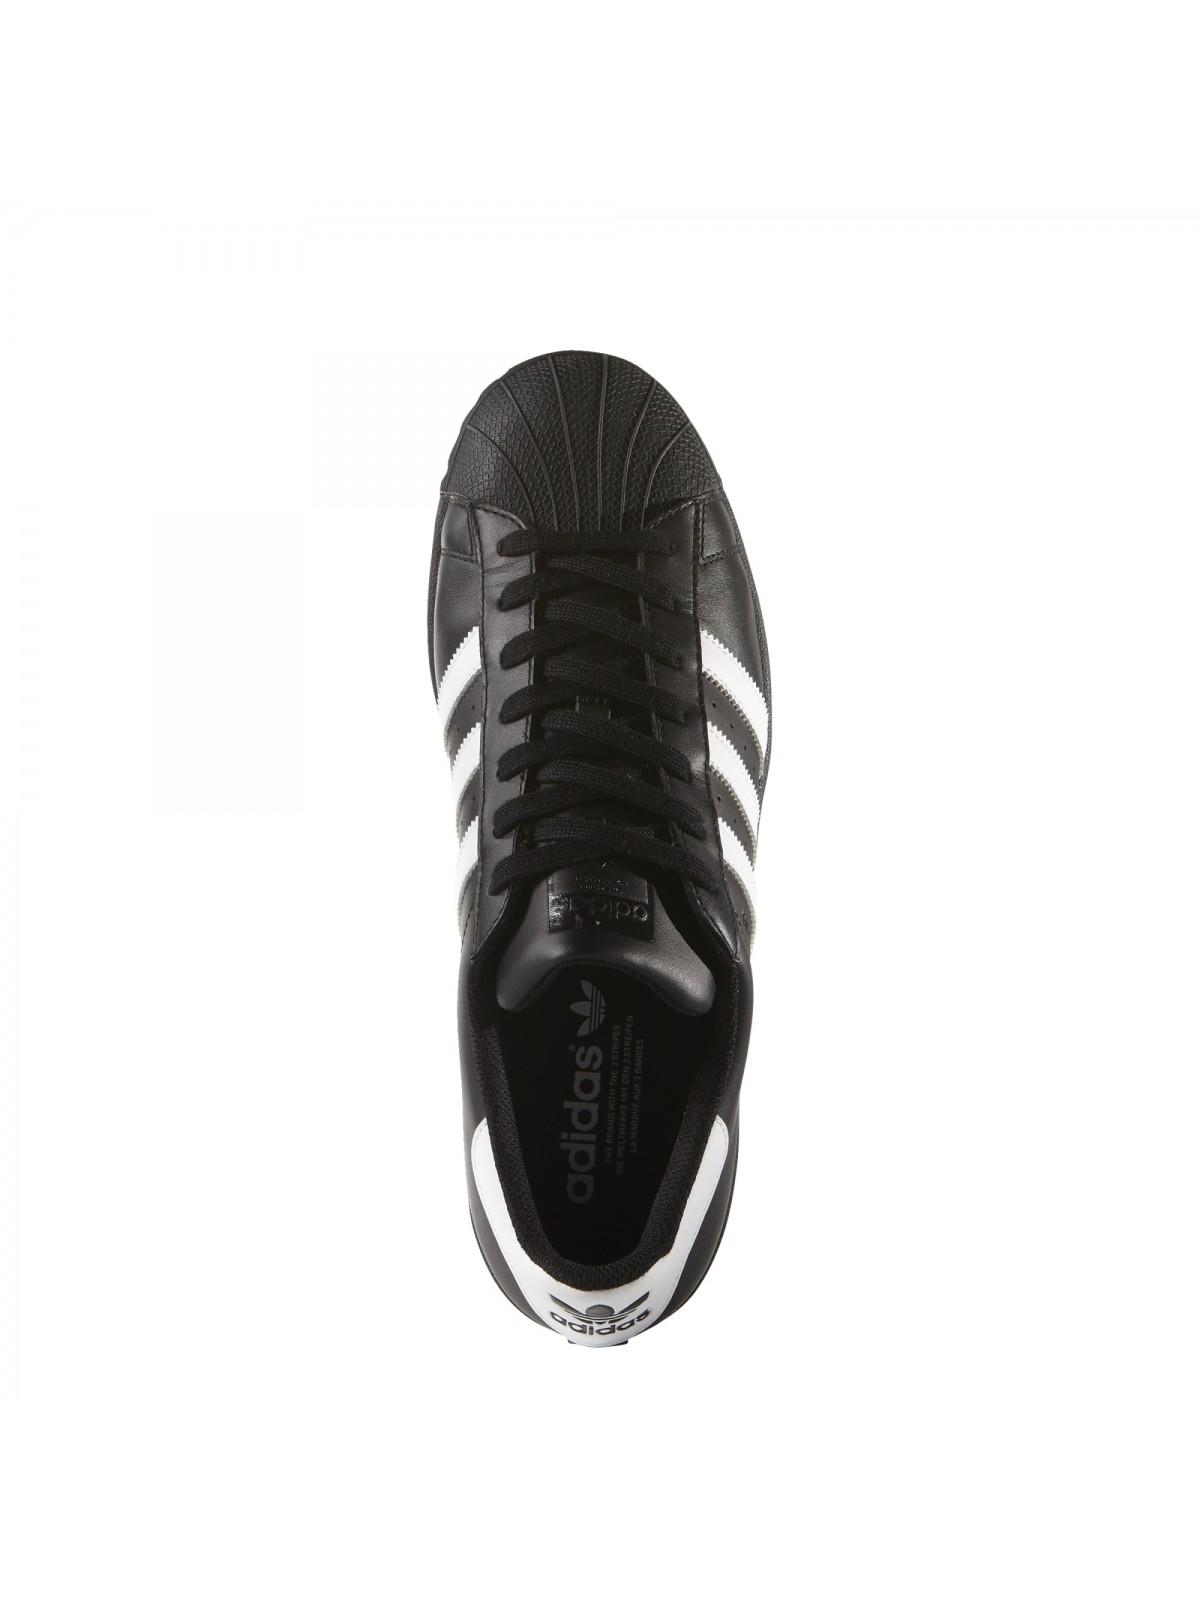 ADIDAS Superstar cuir noir blanc